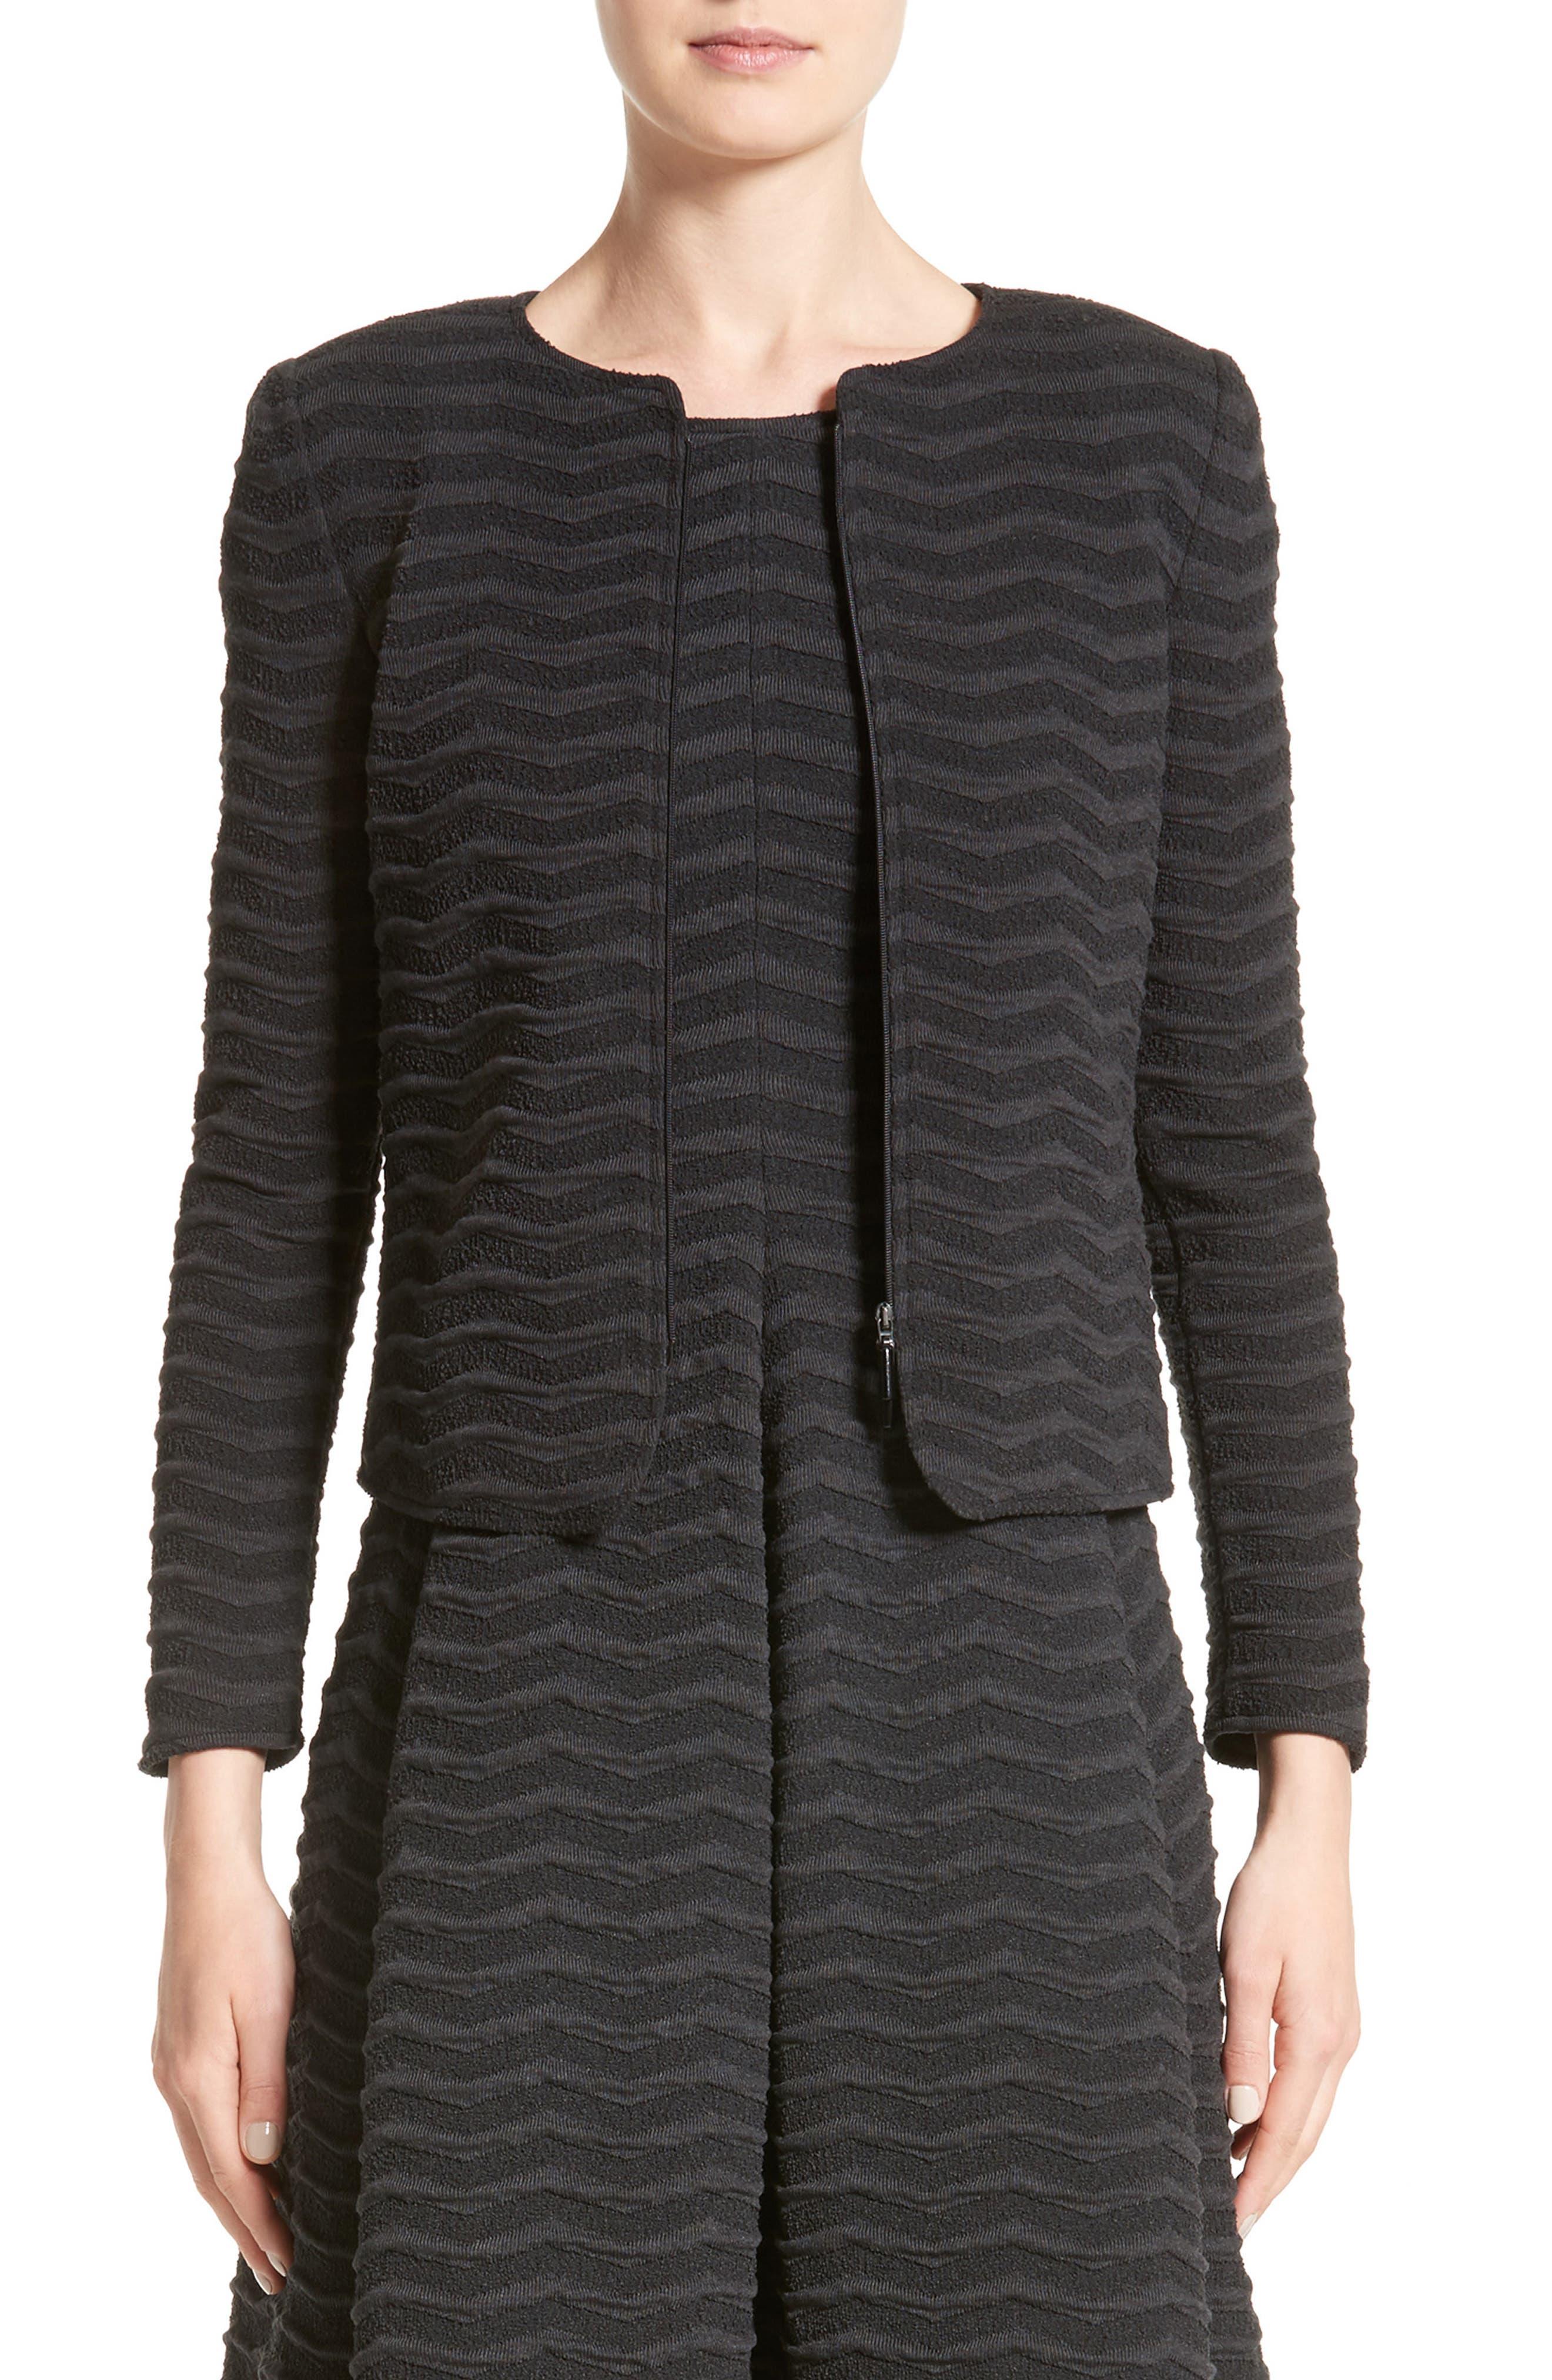 Embossed Jacquard Jersey Jacket,                         Main,                         color, Dark Grey